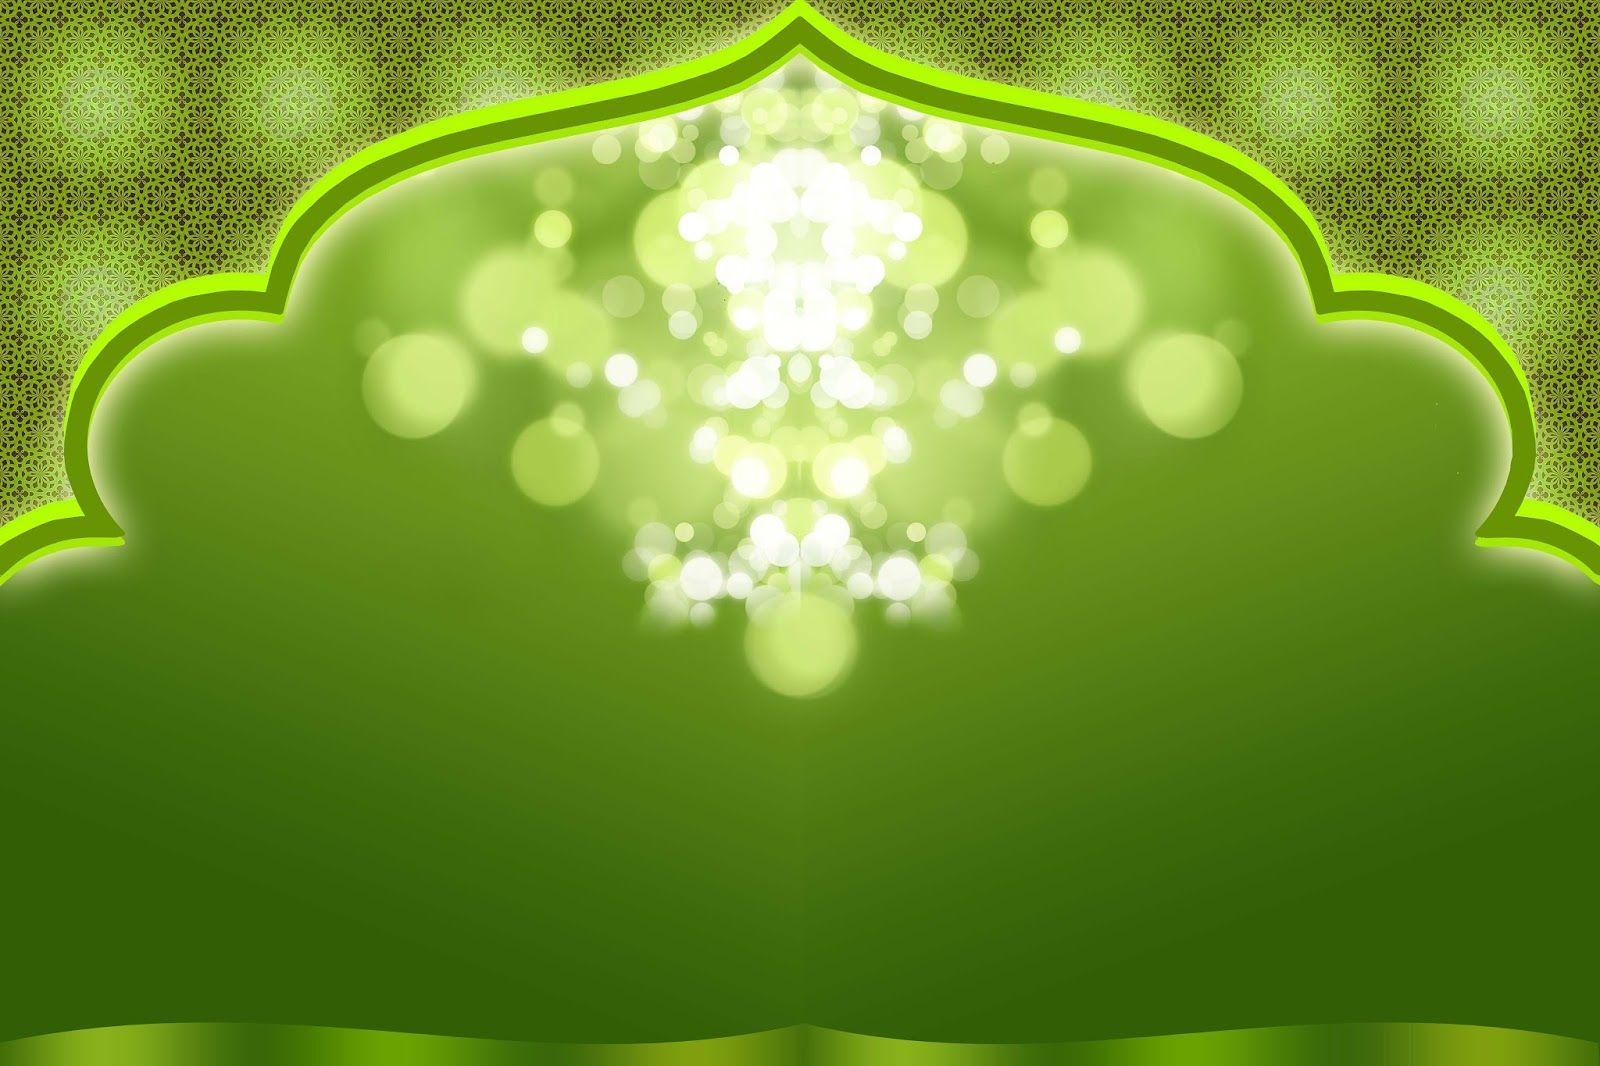 Islamic Background Wallpaper Green Presentation   Background Hijau ...